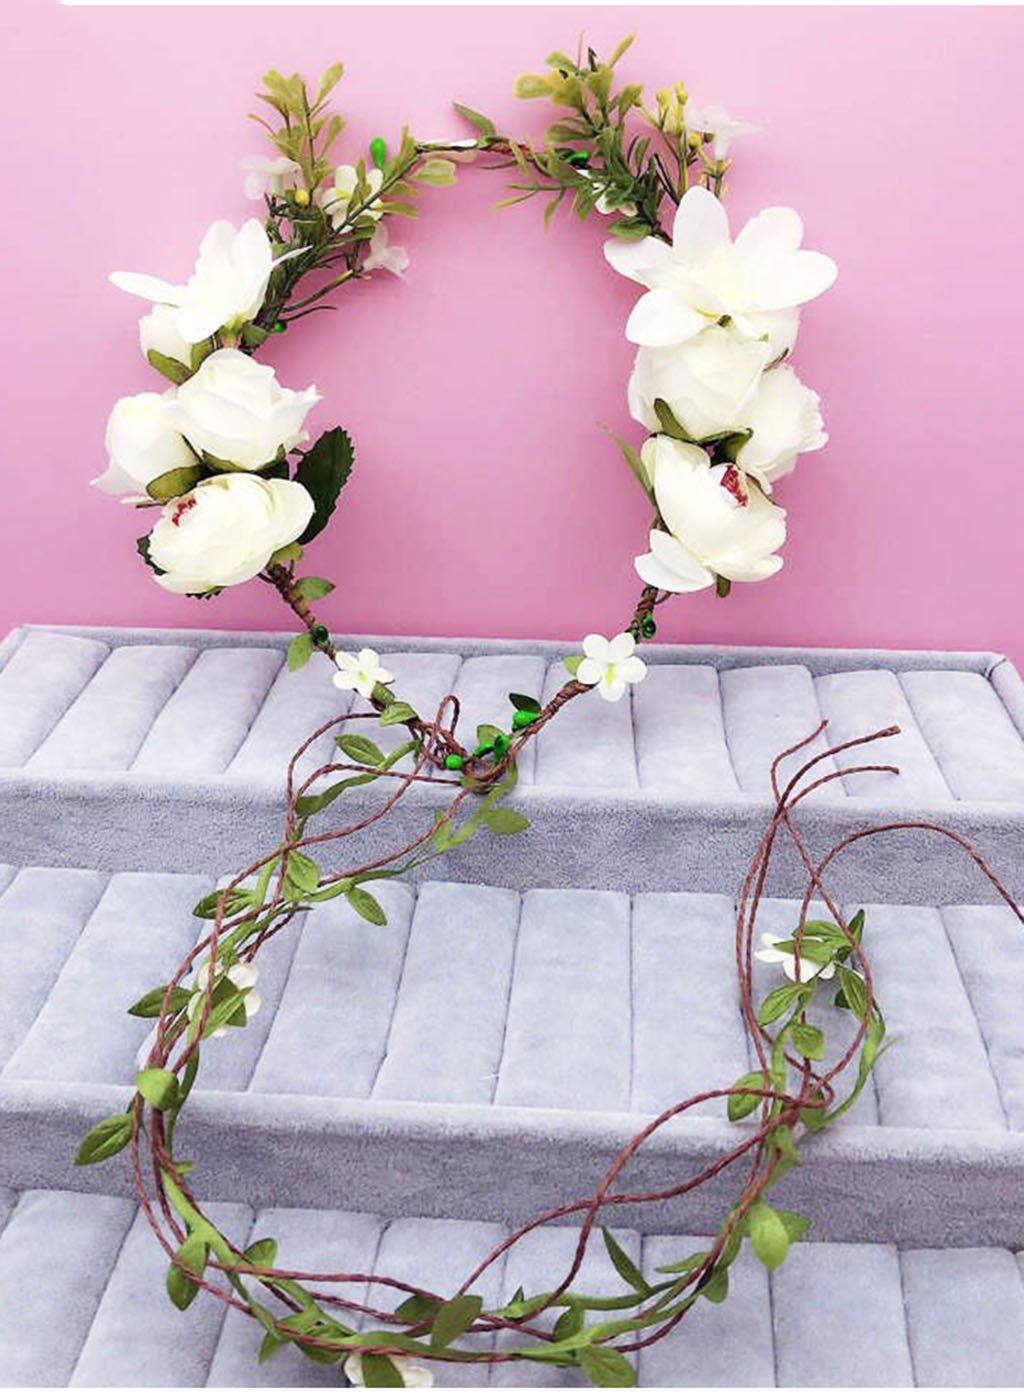 Wreath Flower, Headband Flower Garland Handmade Wedding Bride Party Ribbon Headband Wristband Hairband Red (Color : C) by Wreath